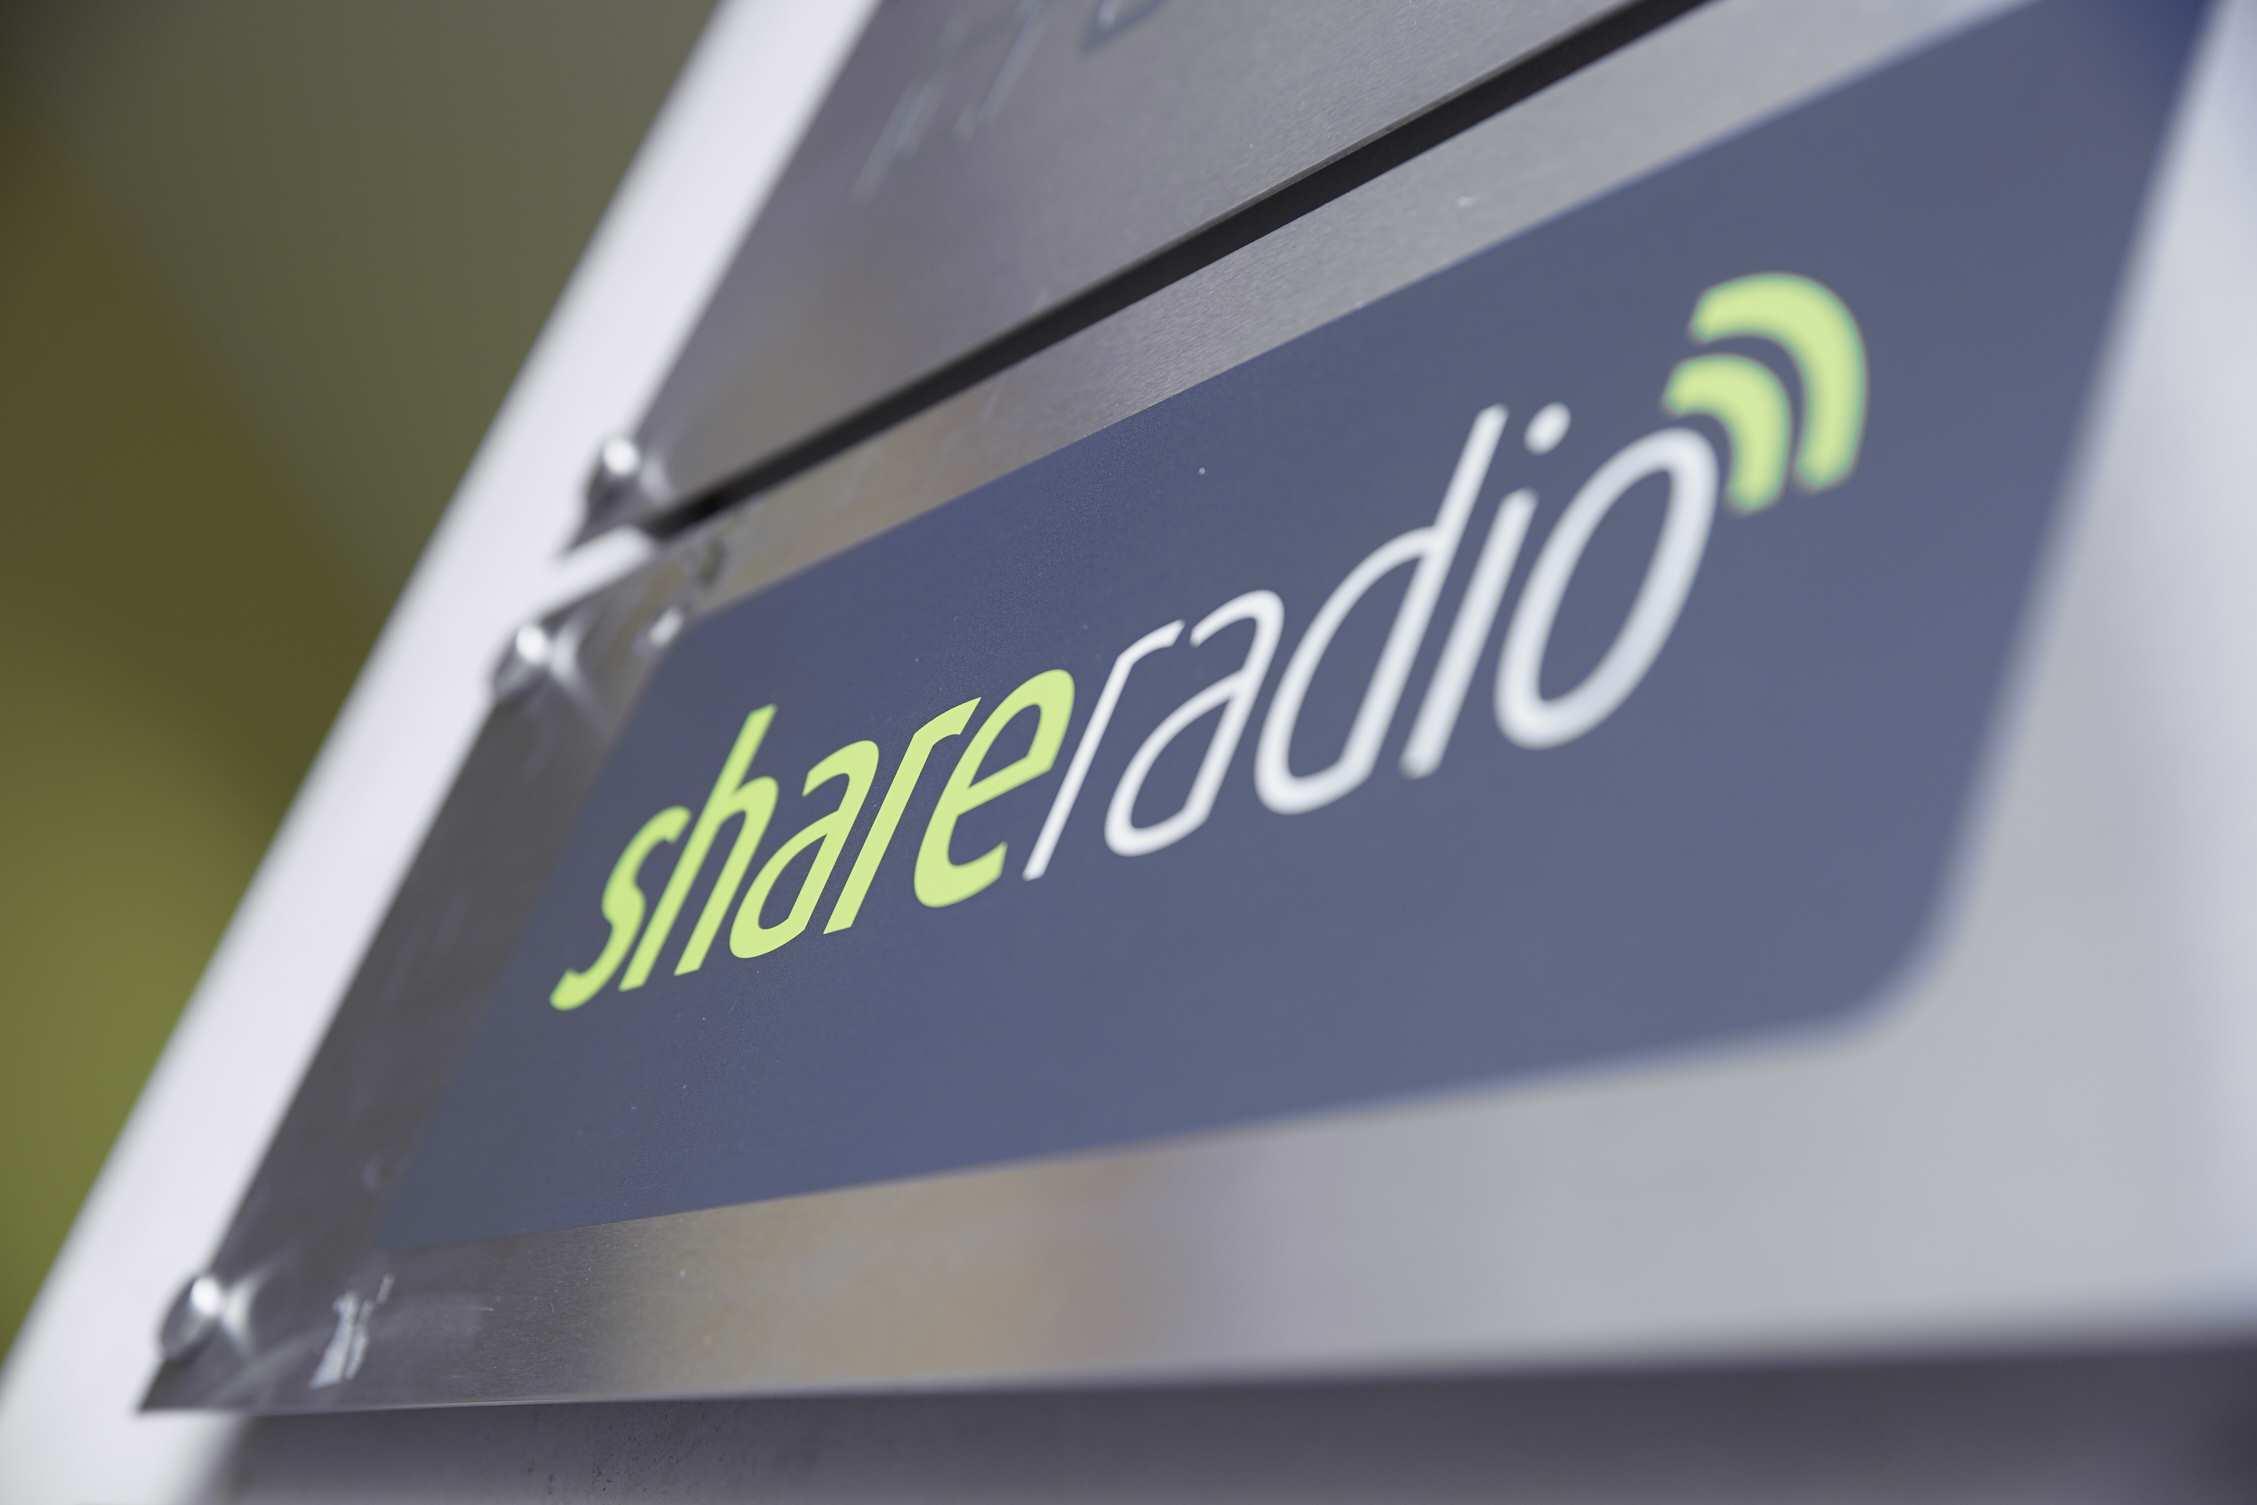 Share Radio logo on a sign